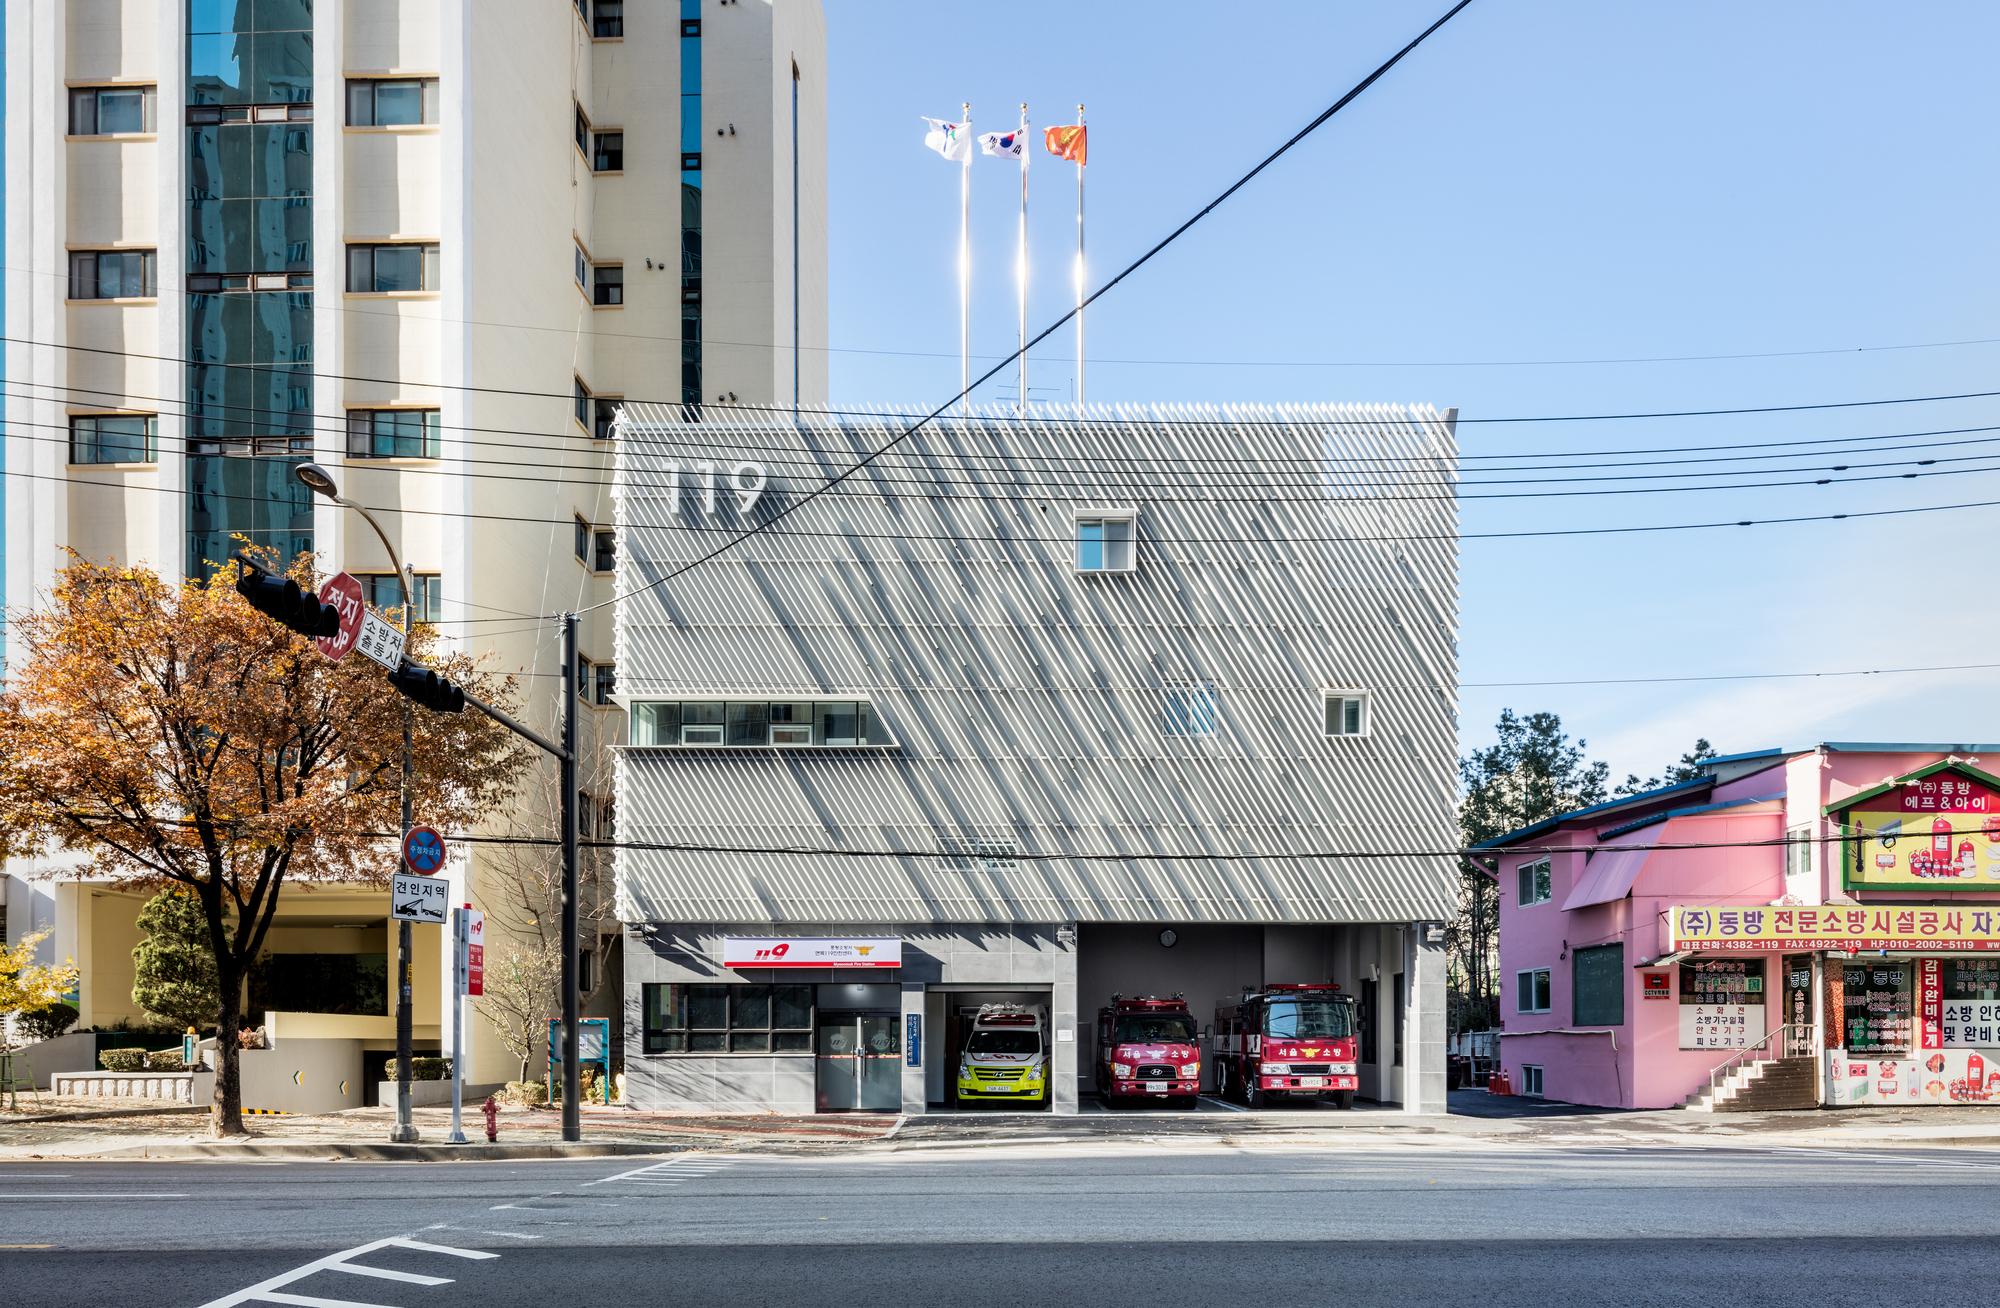 Myeonmok Fire Station / Yong Ju Lee Architecture